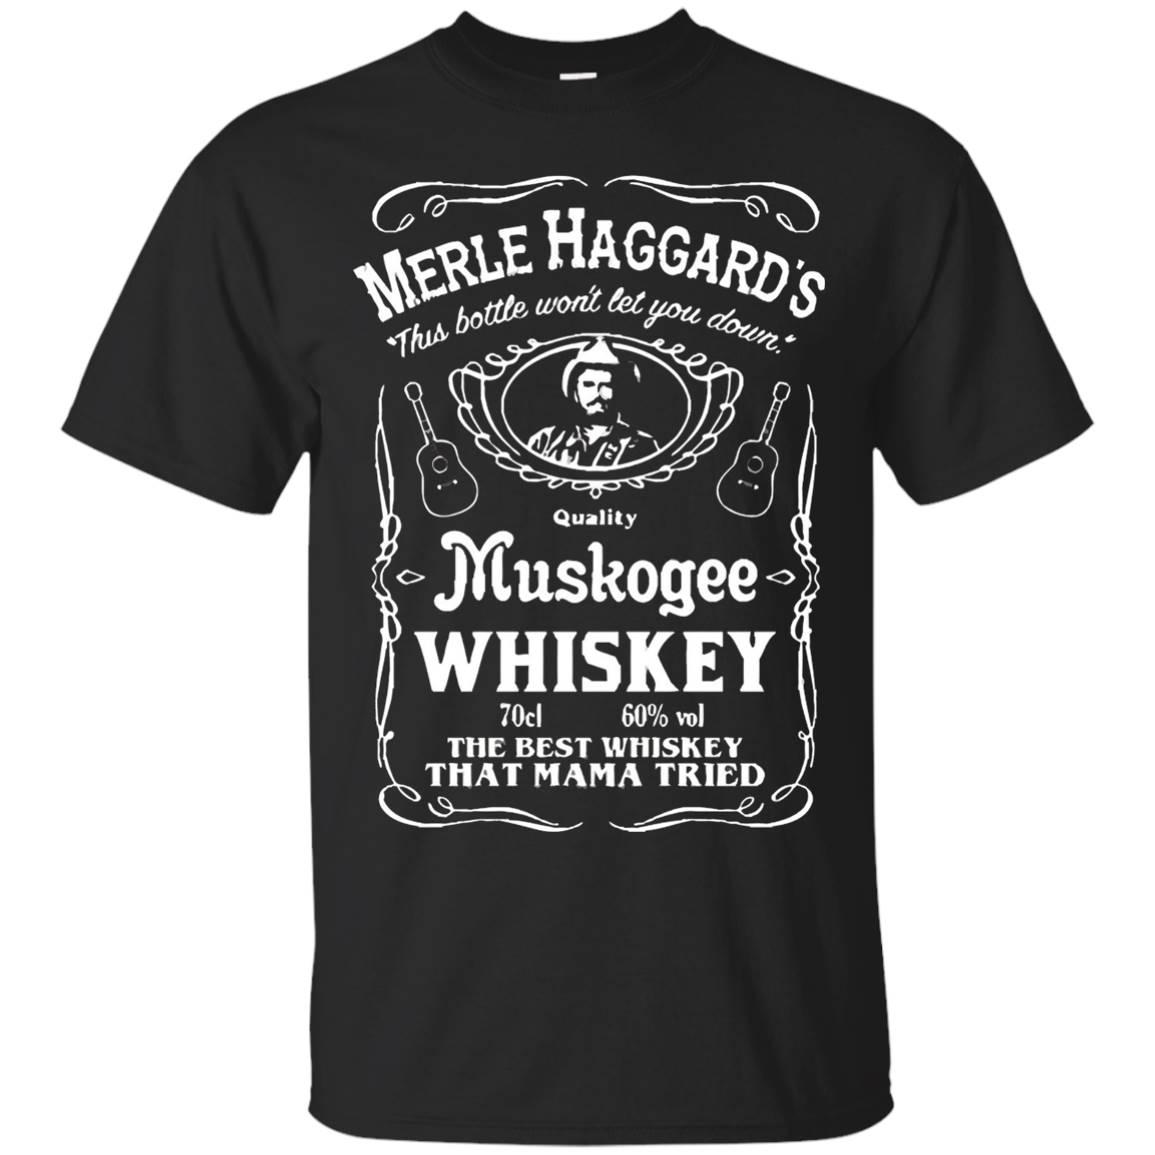 merle haggard's muskogee whiskey